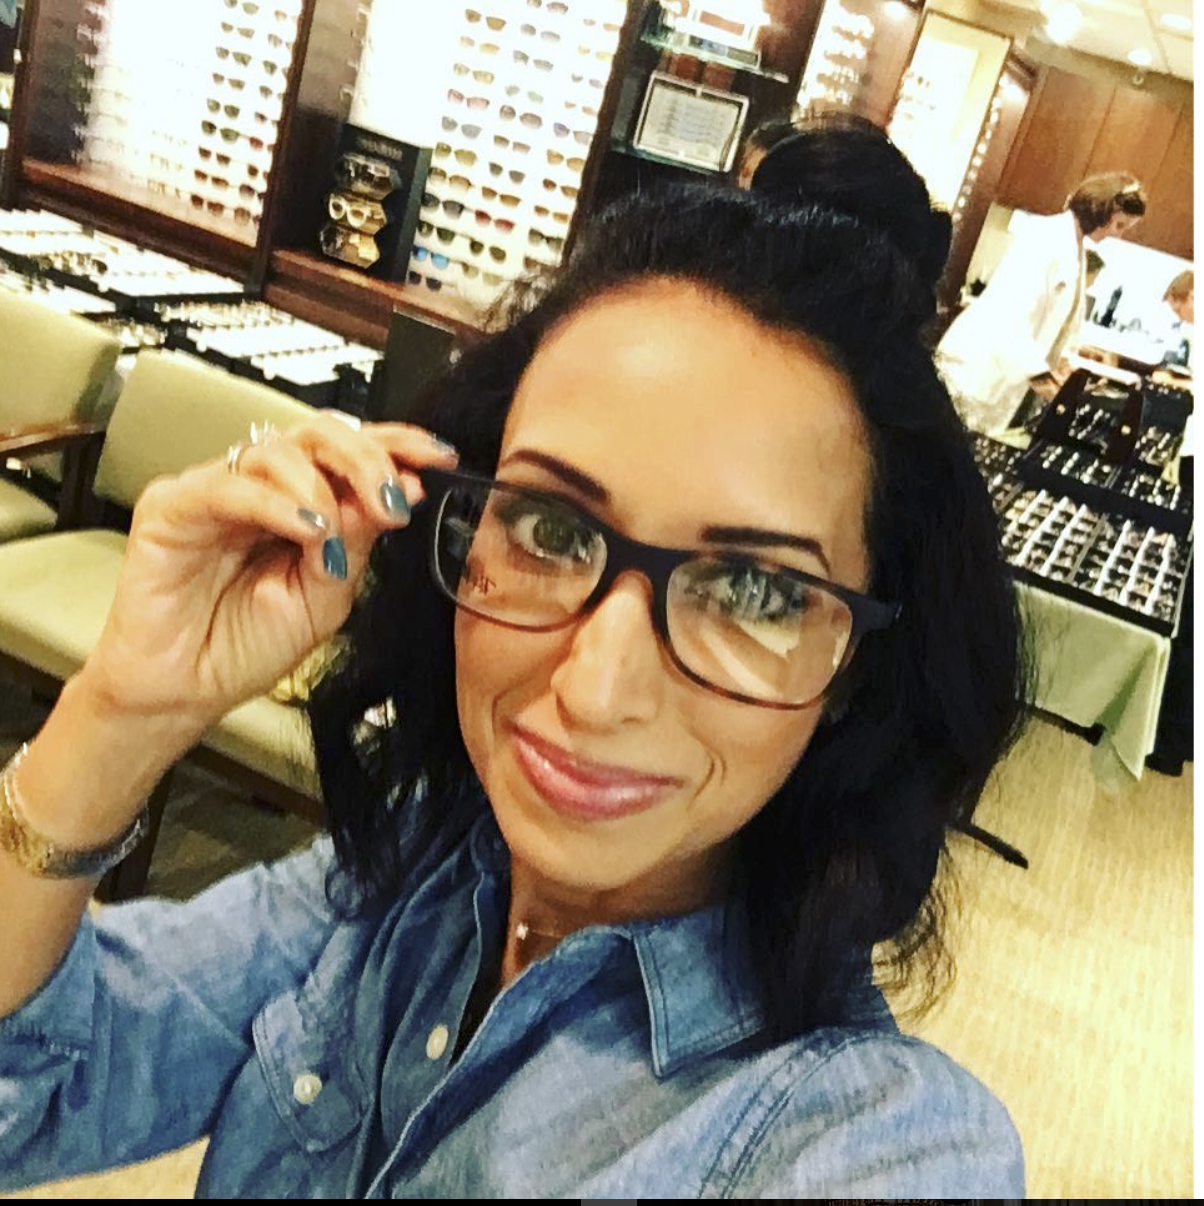 f33704c398 Adapting to New Glasses - Dr. Rupa